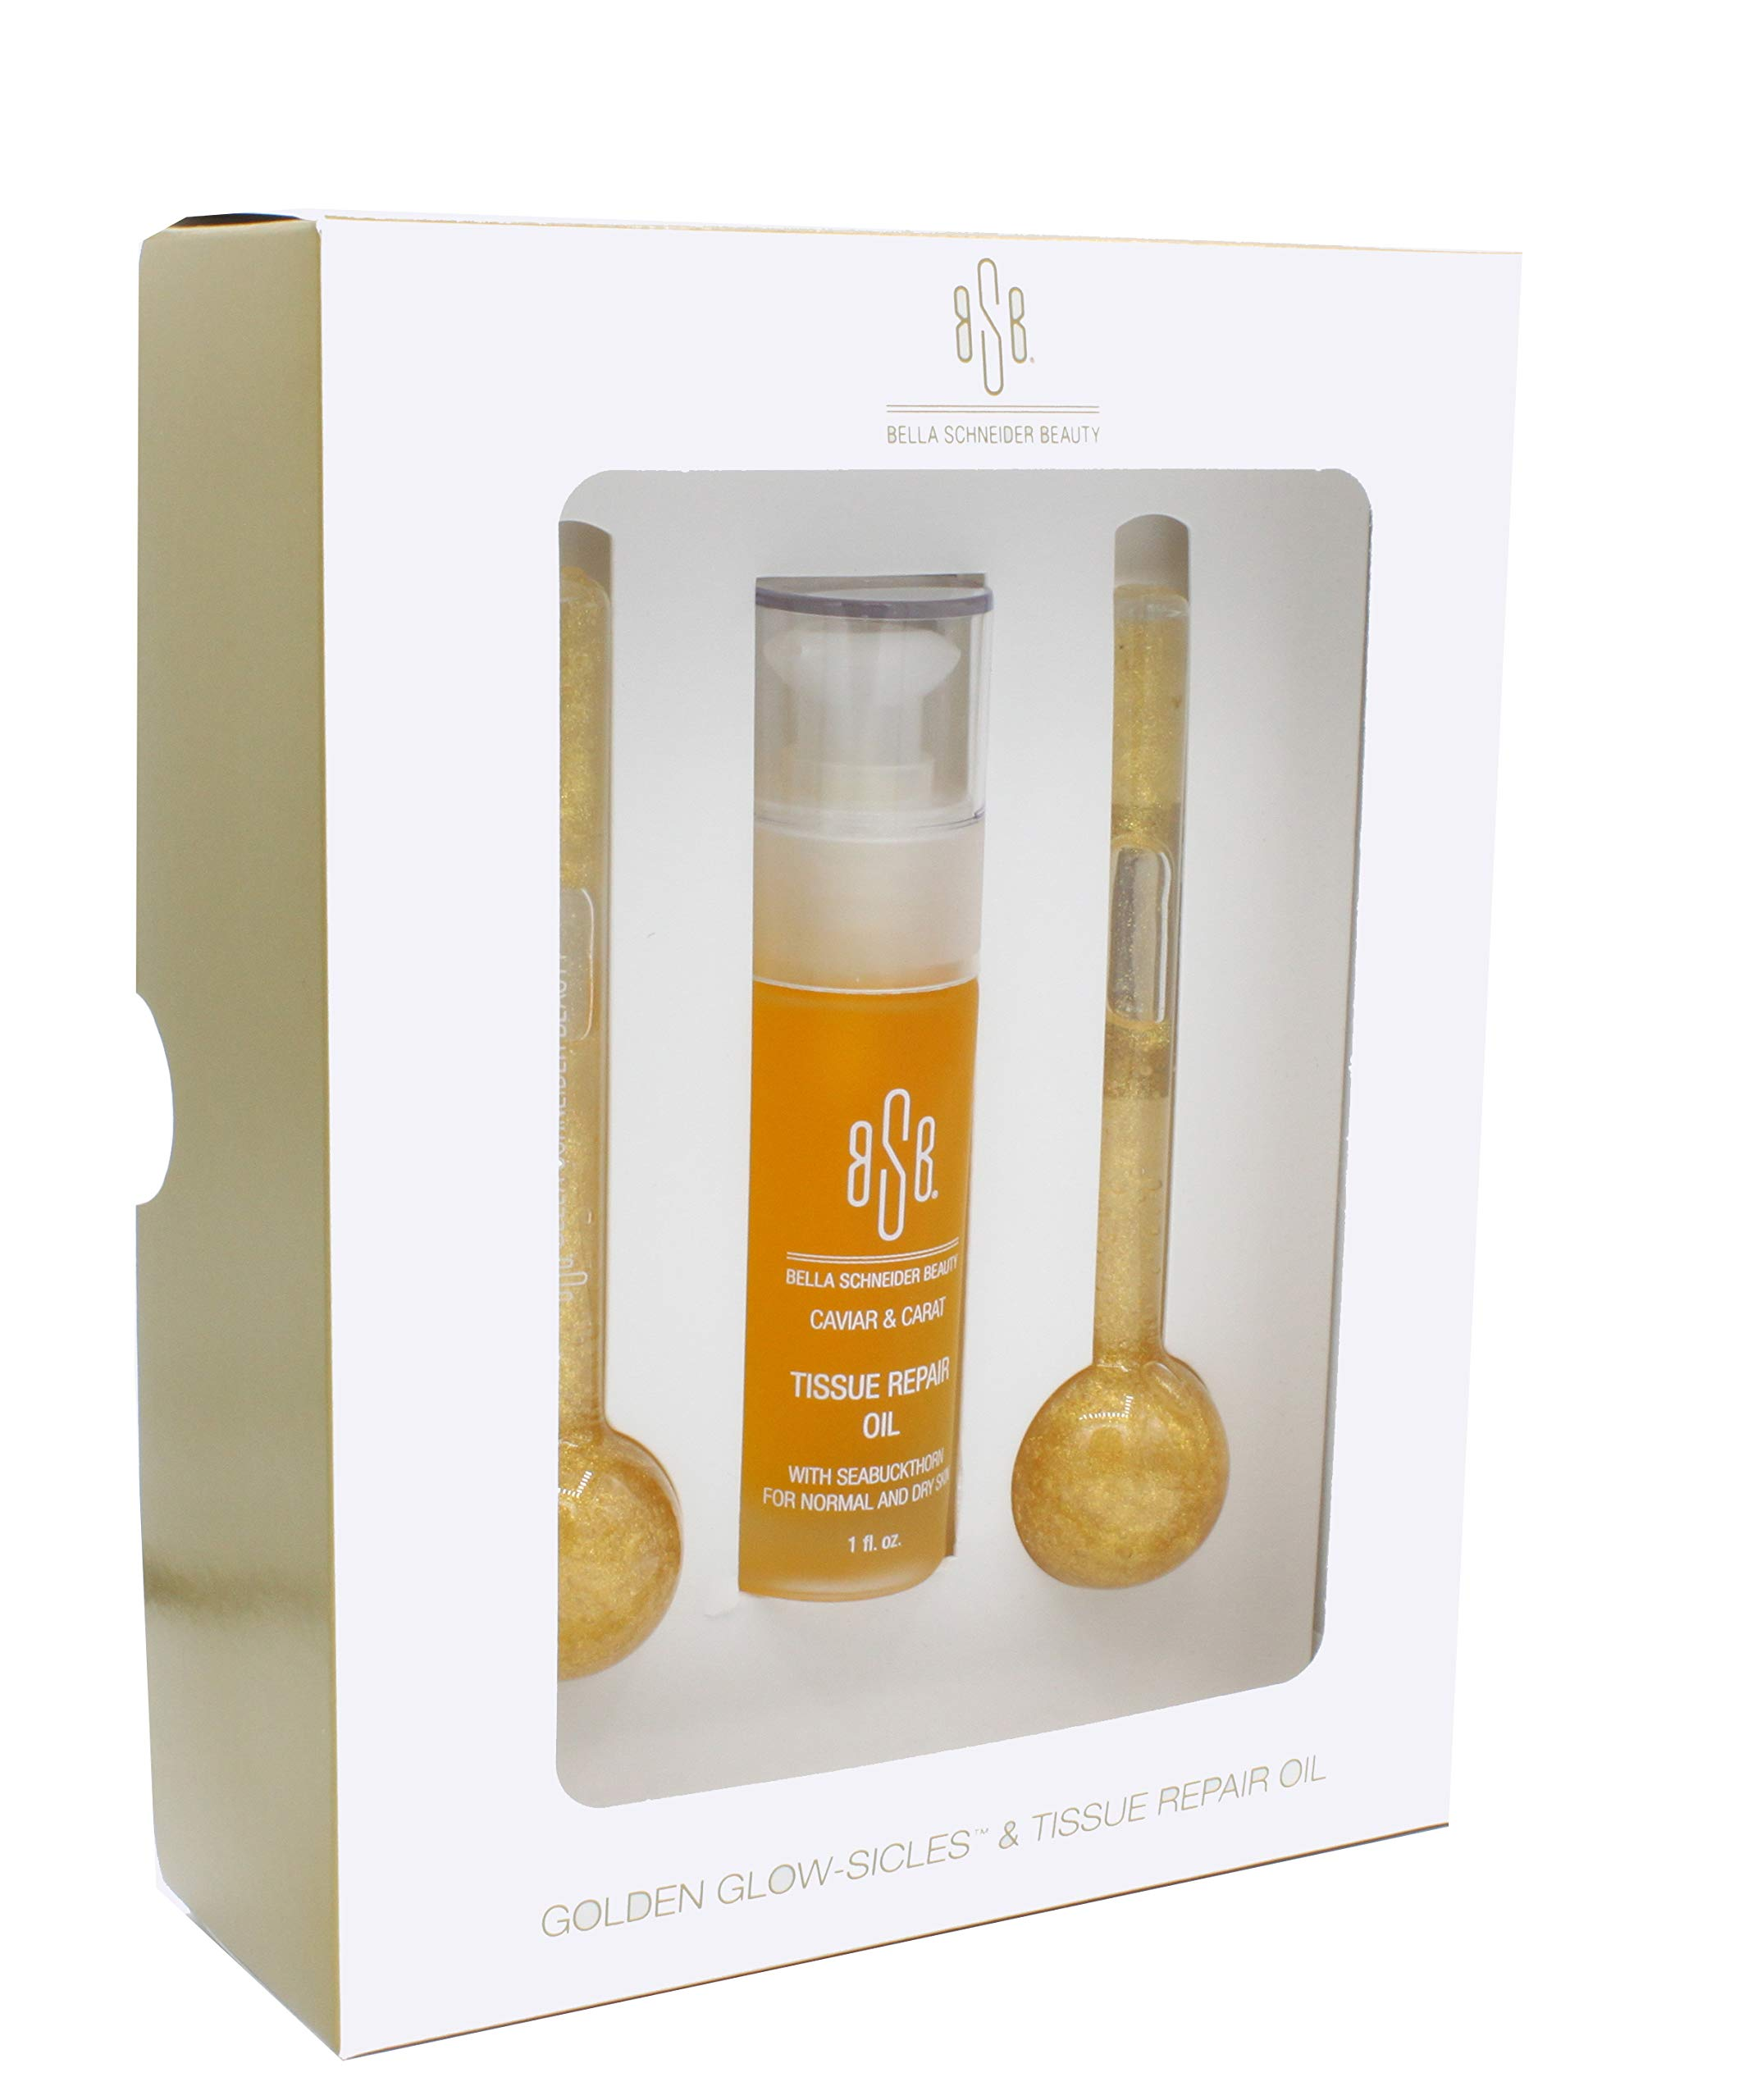 Bella Schneider Beauty BSB Golden Glow - Anti Aging Face Moisturizer, Tissue Repairing Facial Oil, Skin Hydrating & Tightening, Anti Wrinkle Neck Firming Oil, MSRP $85.00